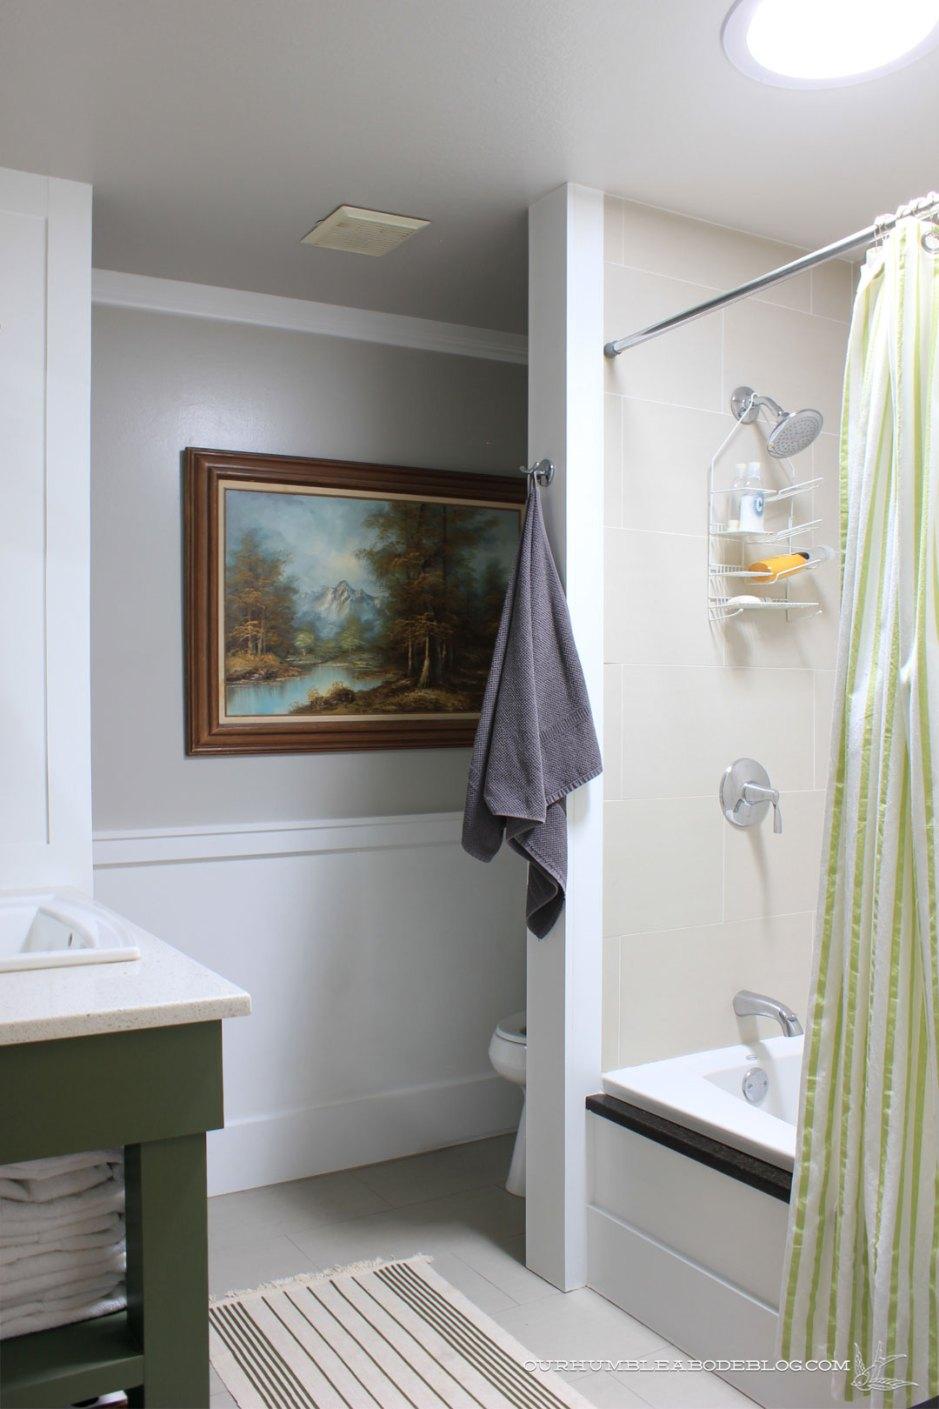 House-Upgrades-Solar-Tube-in-Bathroom